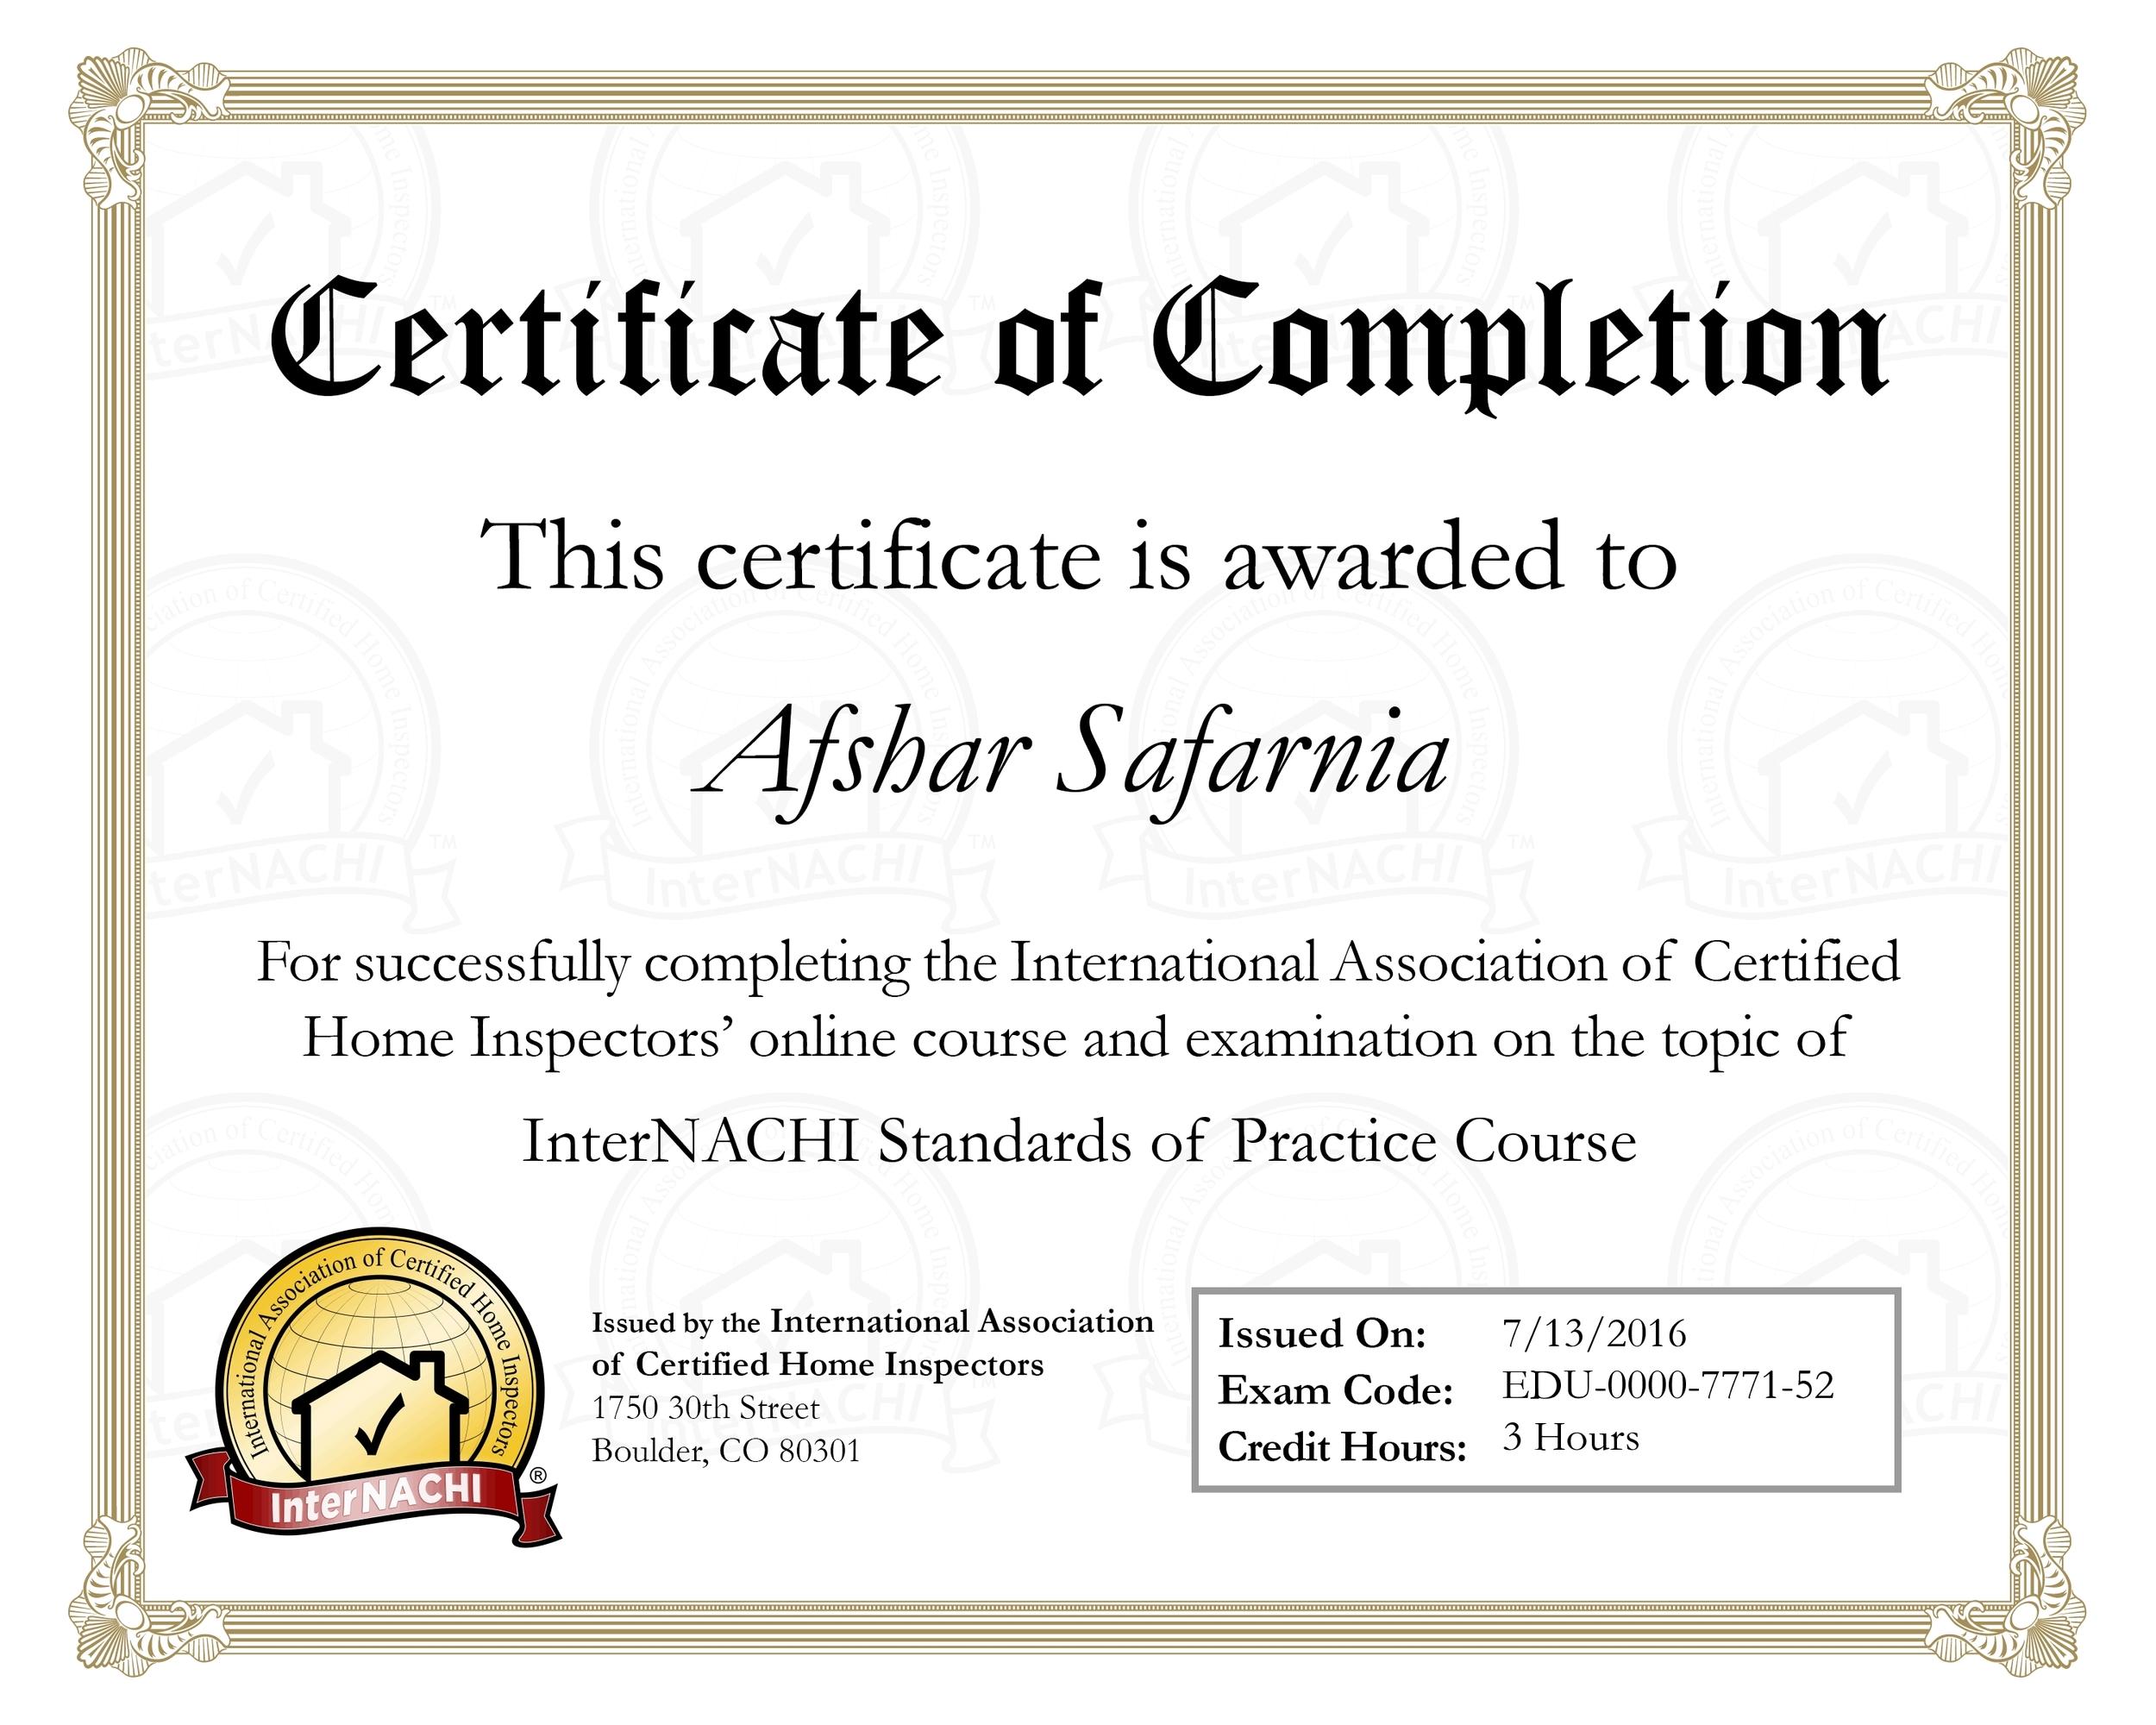 asafarnia_certificate_1 (1).jpg